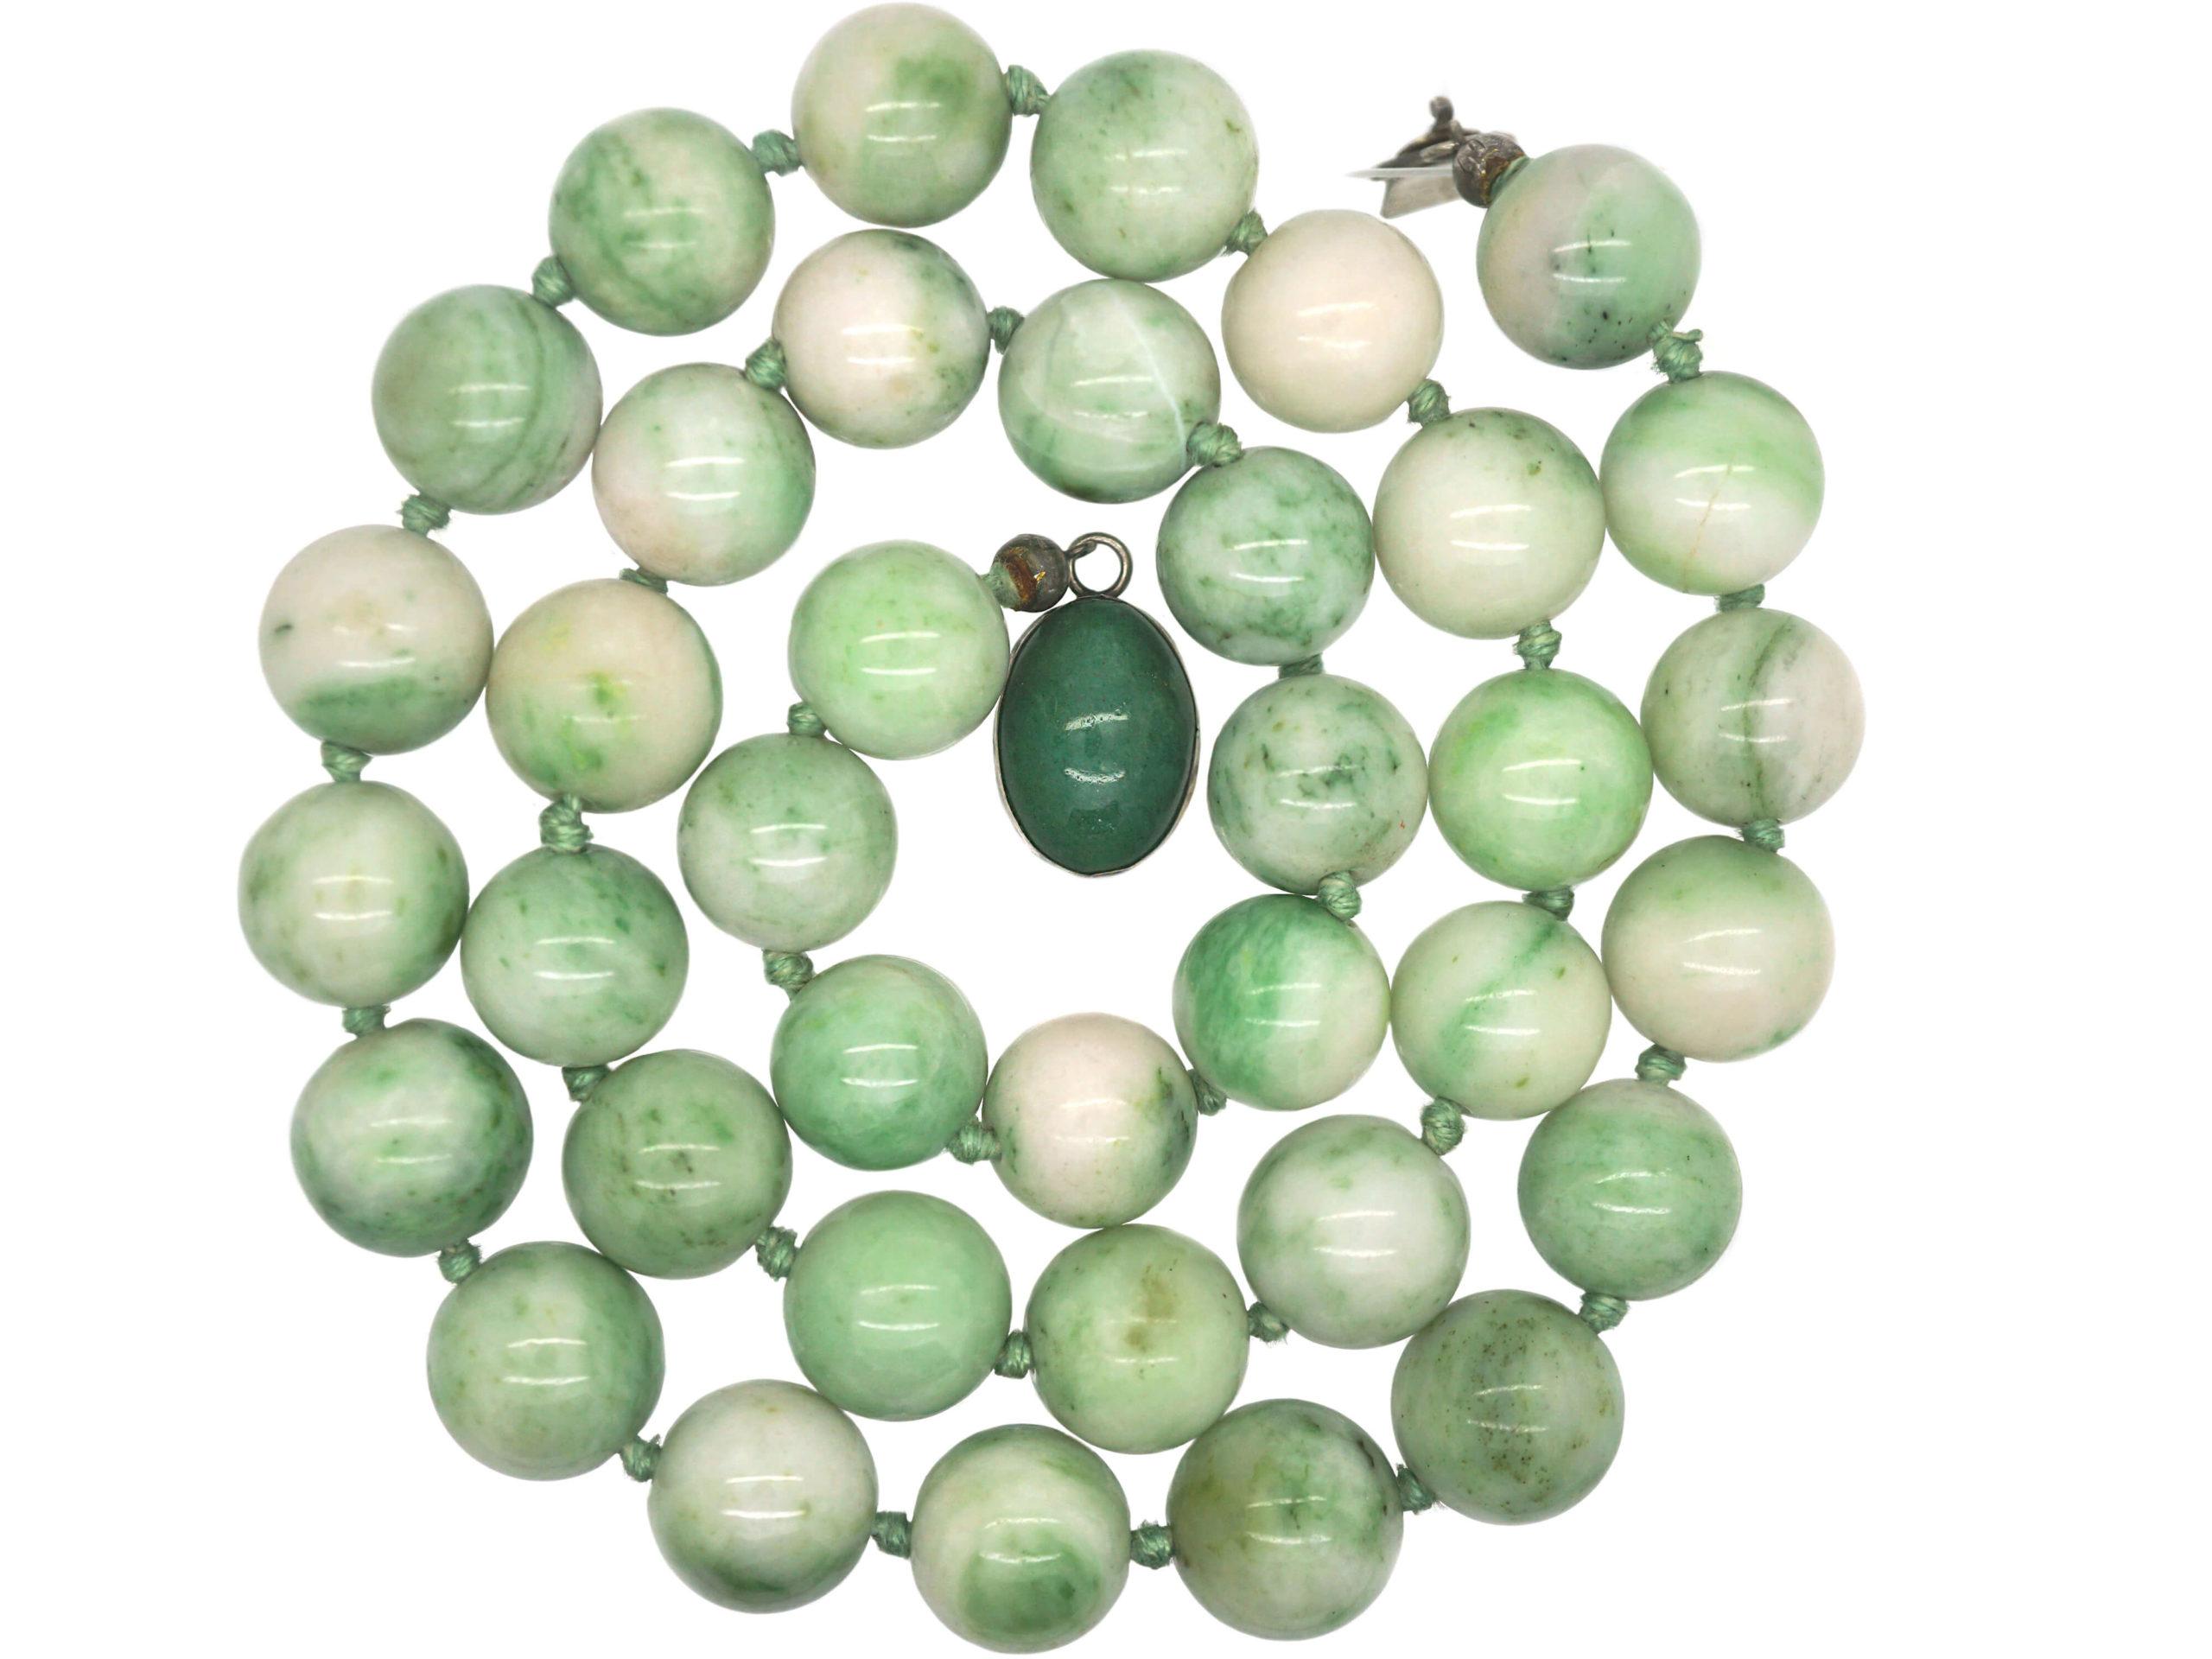 Moss in Snow Jade Beads with Silver & Aventurine Quartz